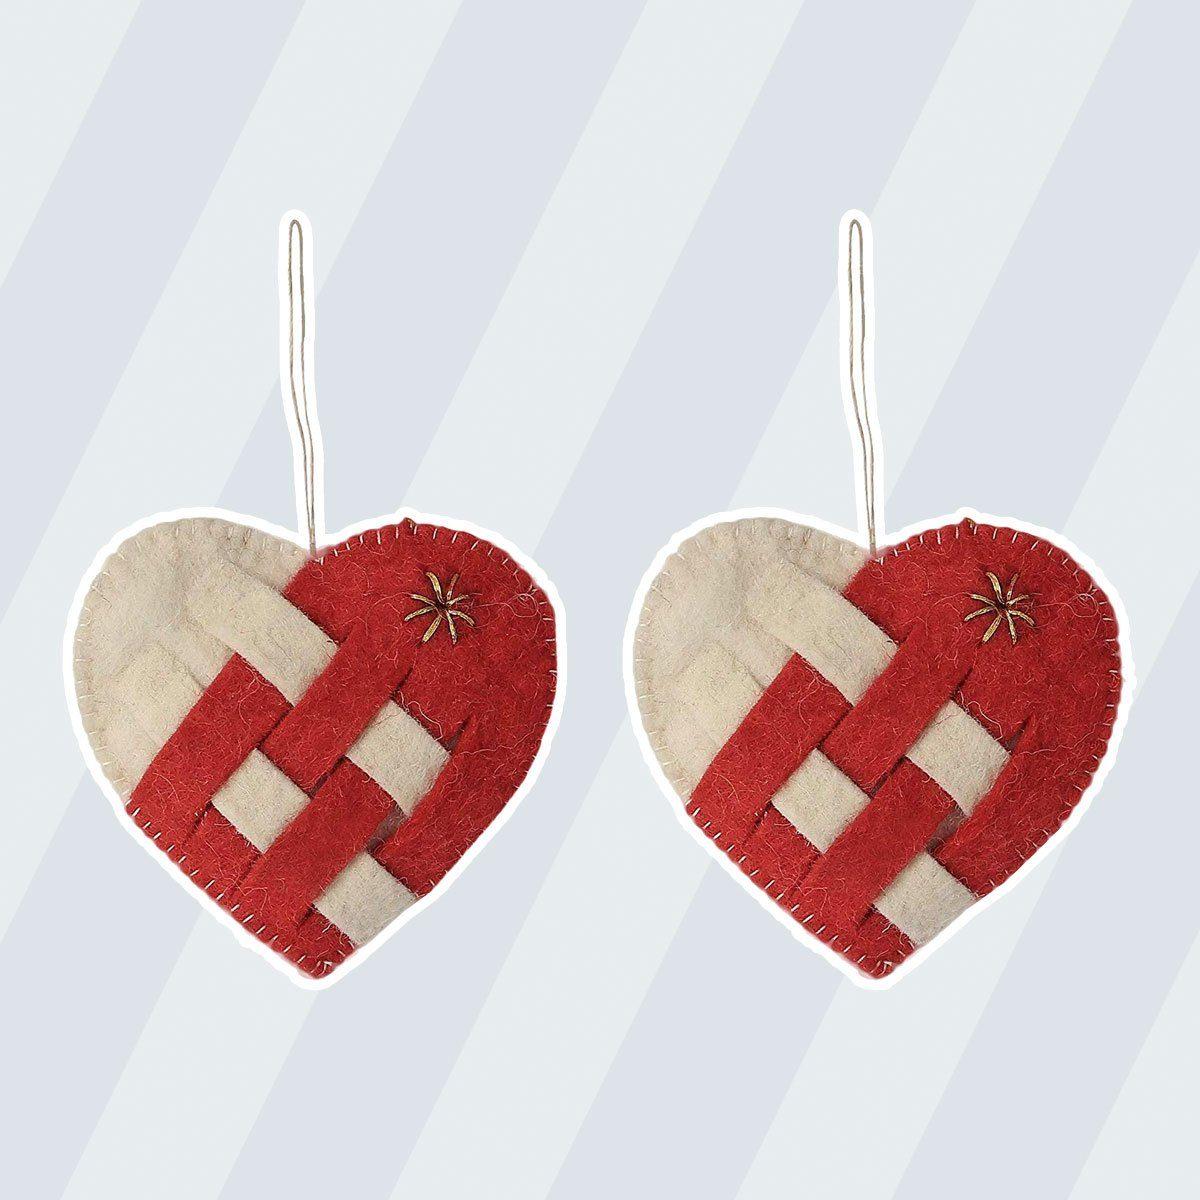 De Kulture Hand Made Felt Pleated Hearts Ornament